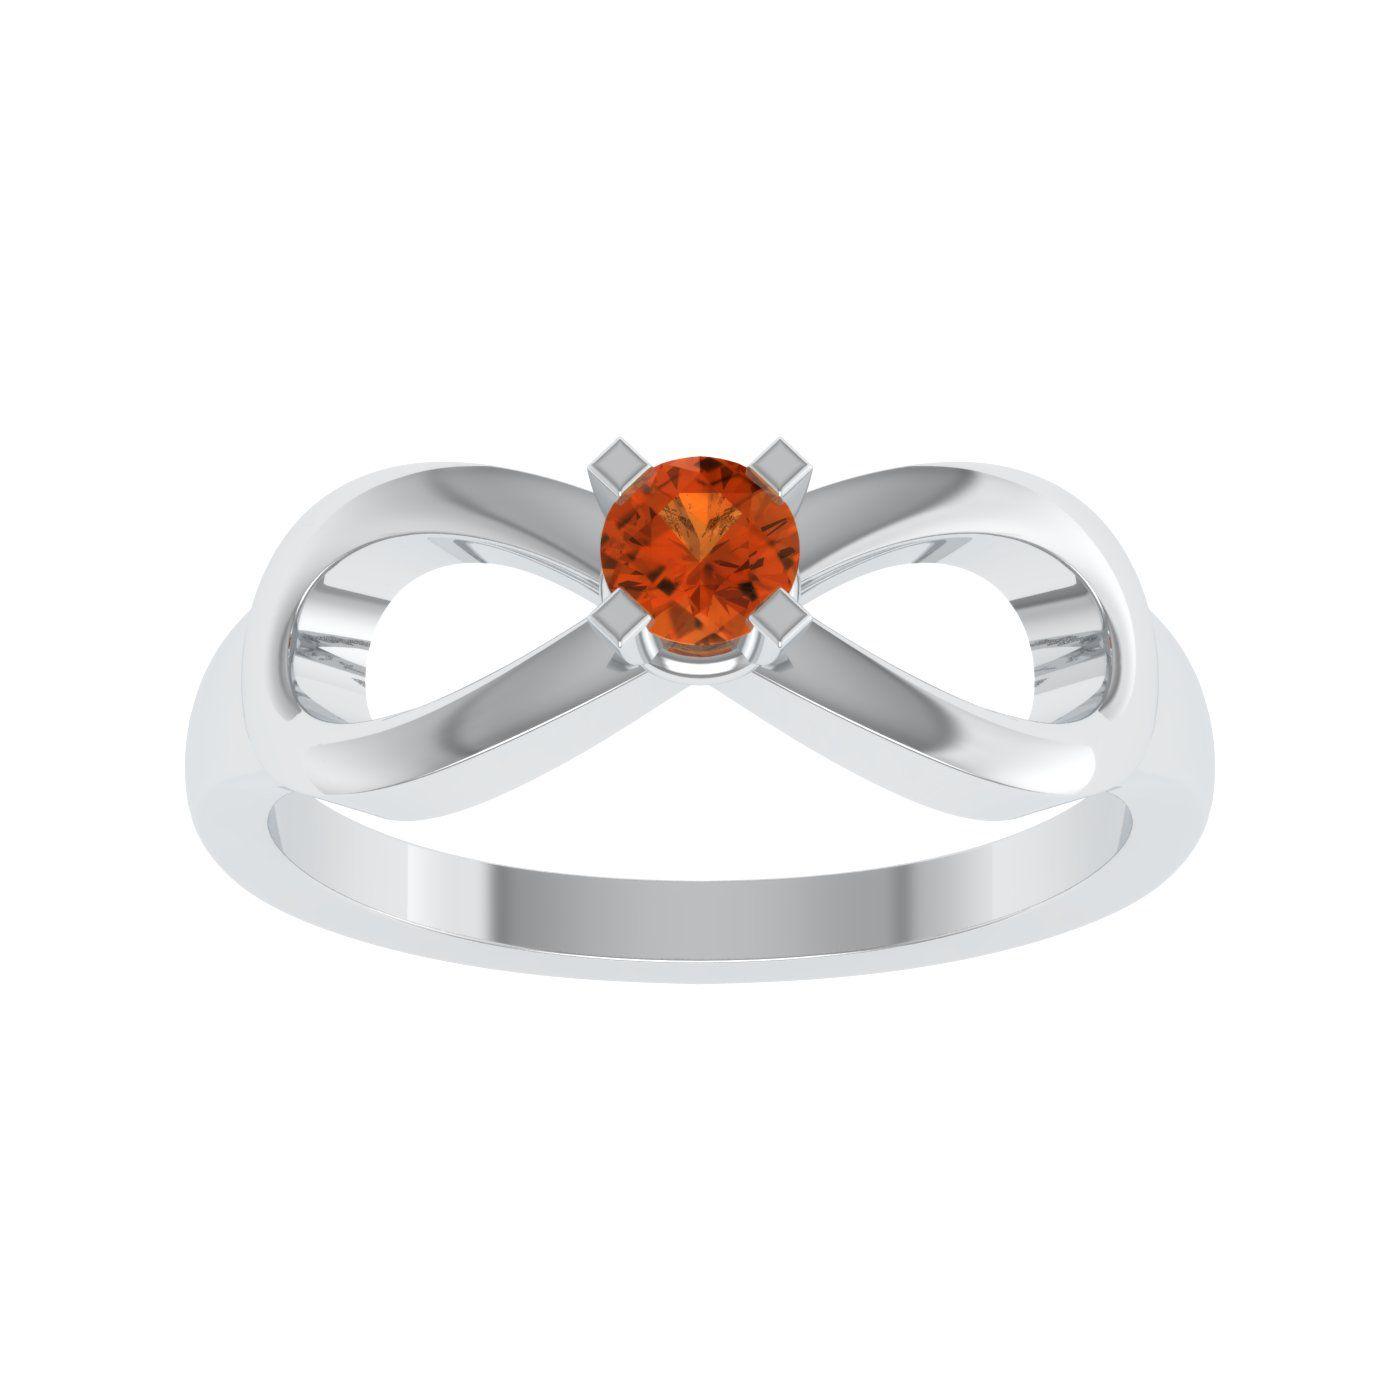 Shreeji Jewellers 92.5 Silver Ring